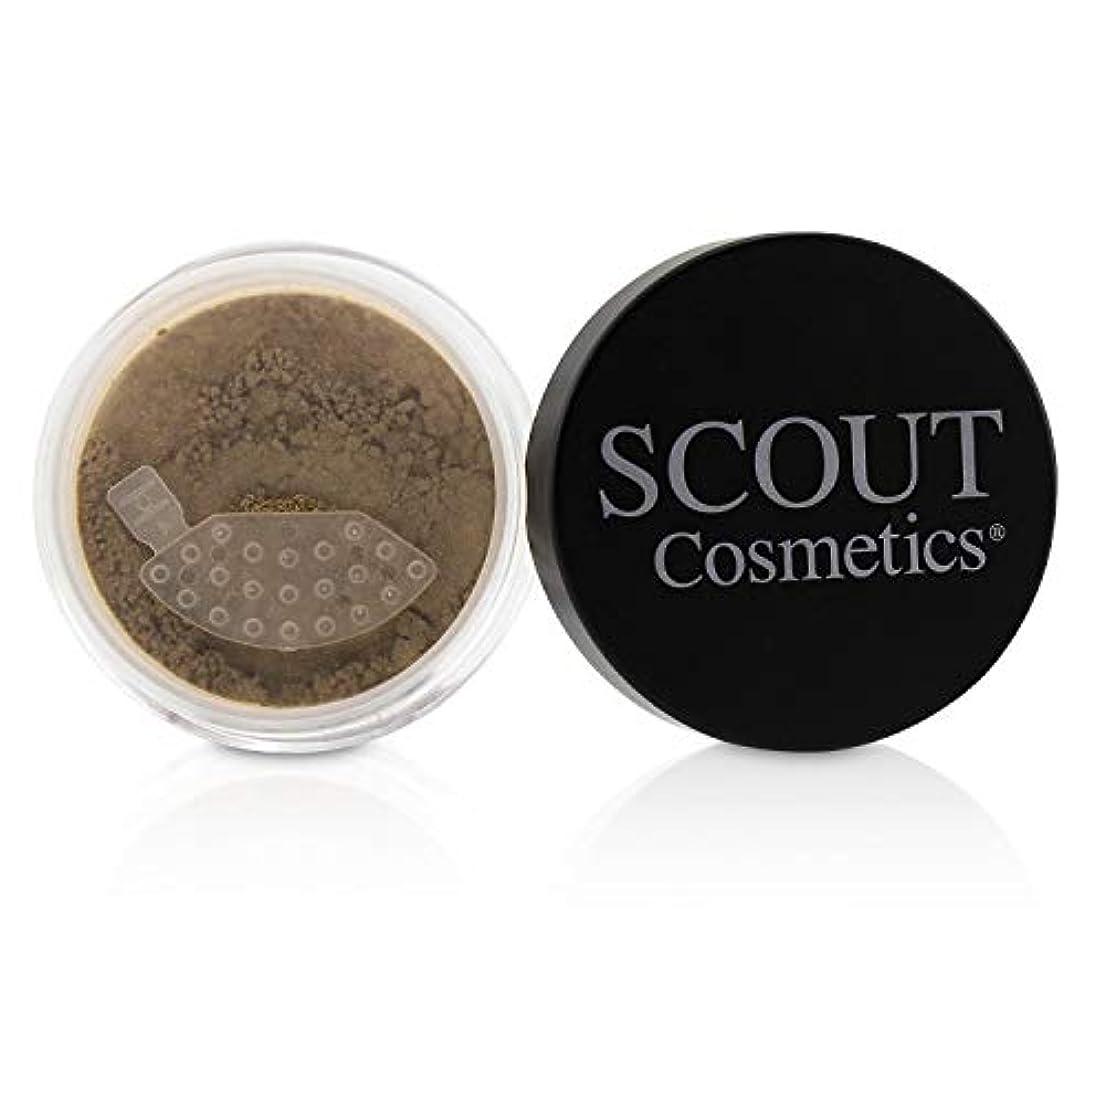 高速道路名詞願望SCOUT Cosmetics Mineral Powder Foundation SPF 20 - # Almond 8g/0.28oz並行輸入品